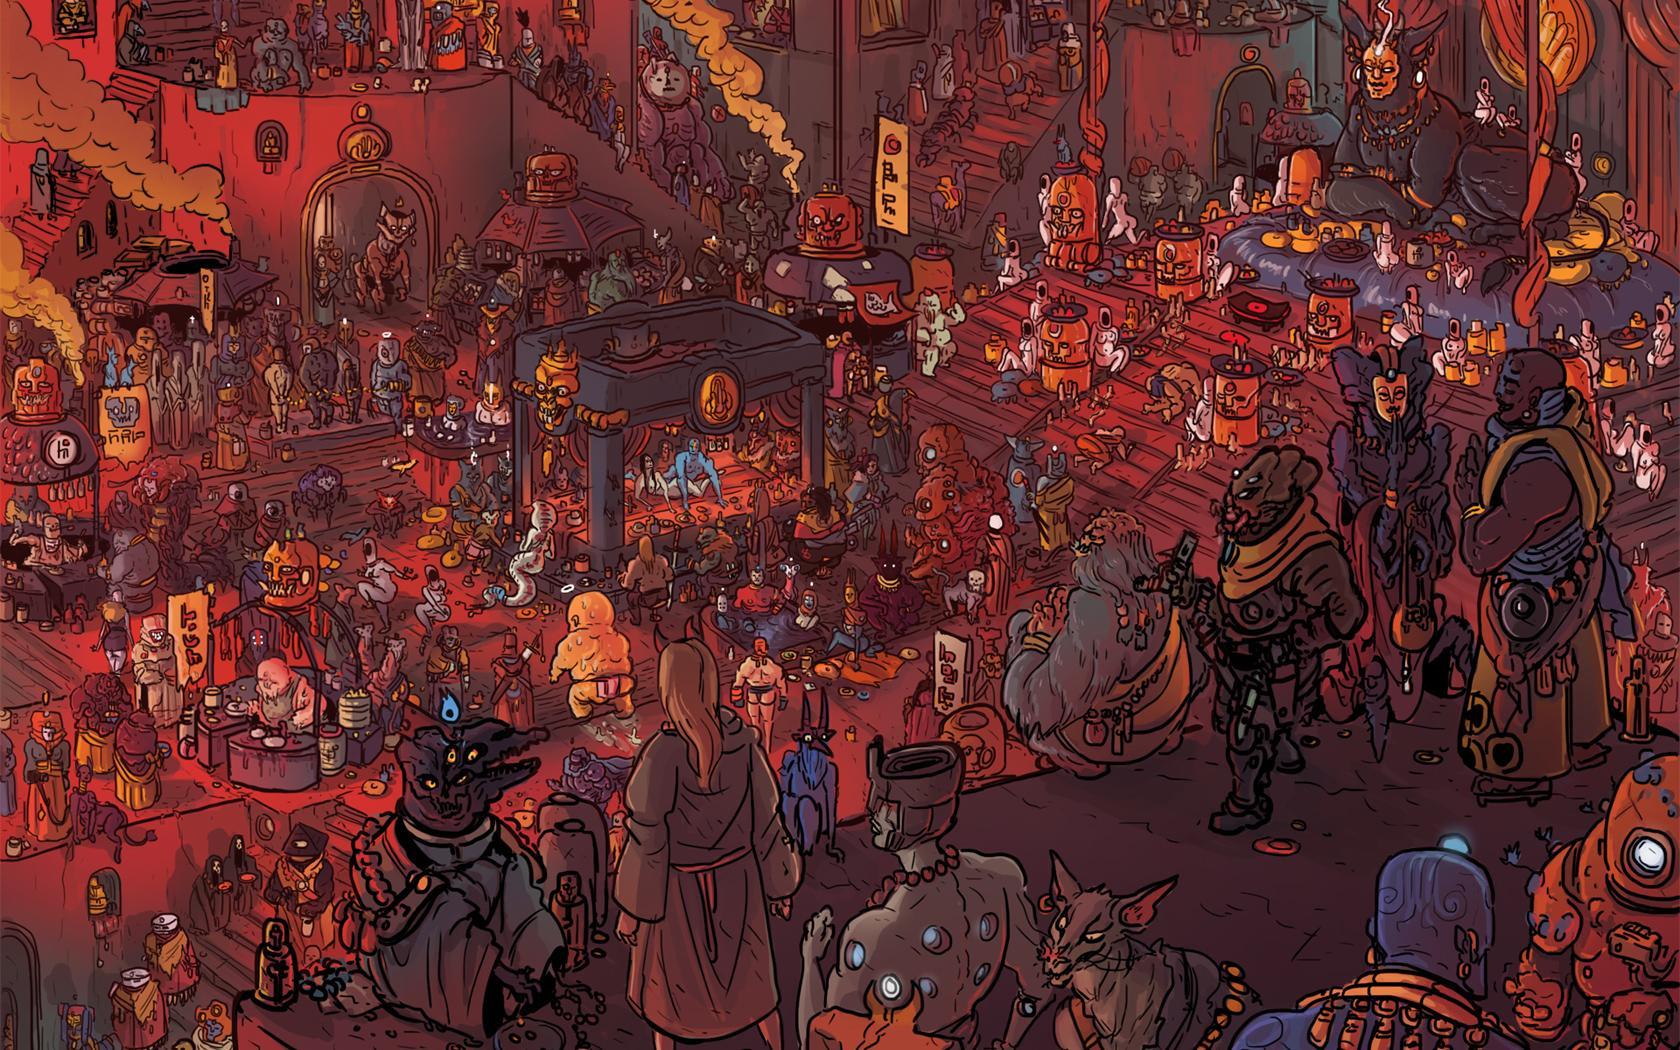 Art by Tom Parkinson-Morgan